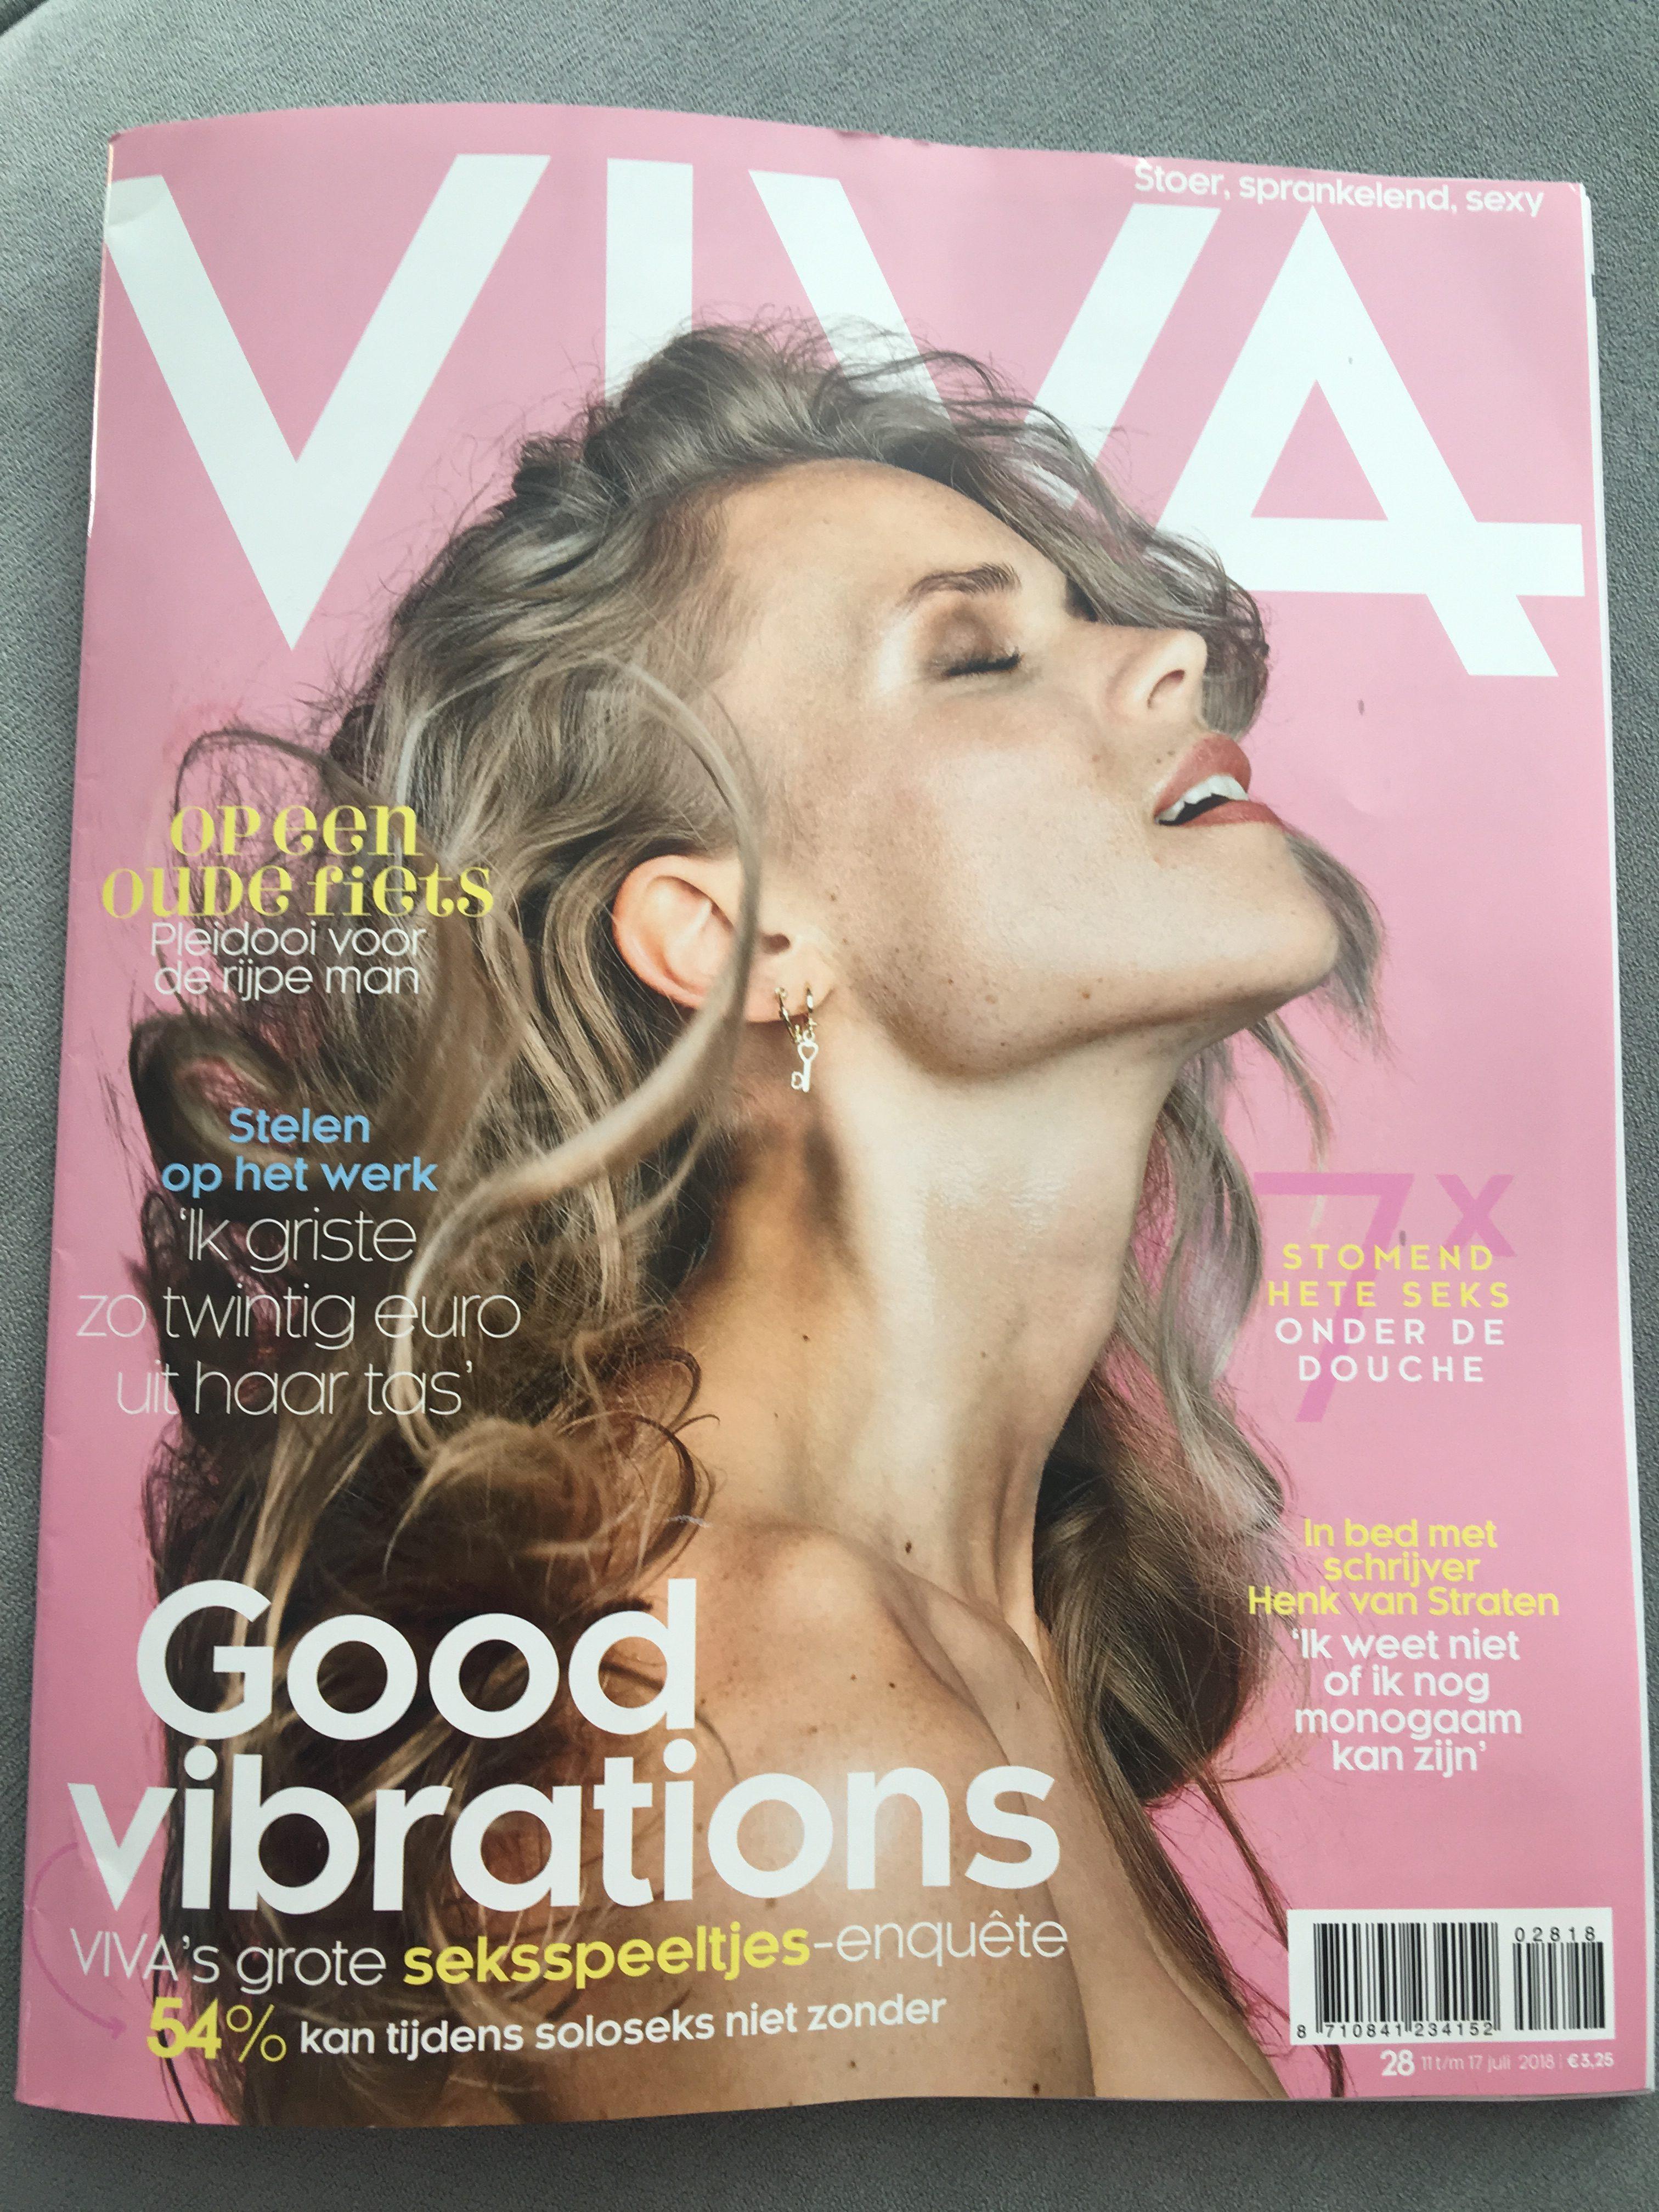 Viva - seksspeeltjes - seksuoloog